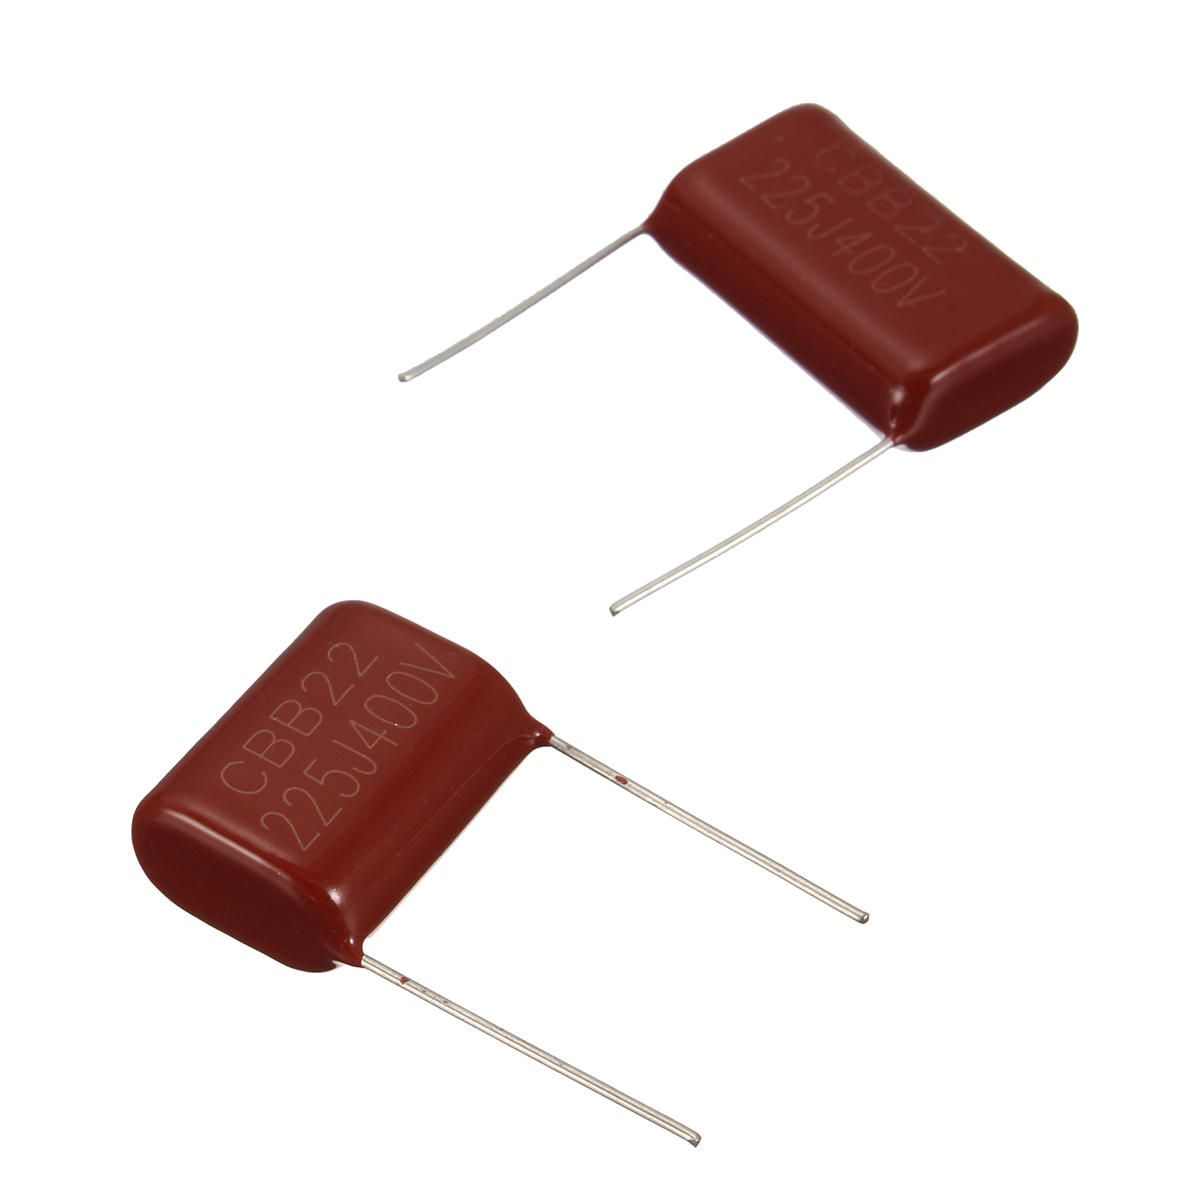 10pcs 400v225j 2 2uf Pitch 25mm 225j400v 225j 400v 2200pf Cbb Polypropylene Film Capacitor Shiny Wire Terminals Connectors Tools And Accessories